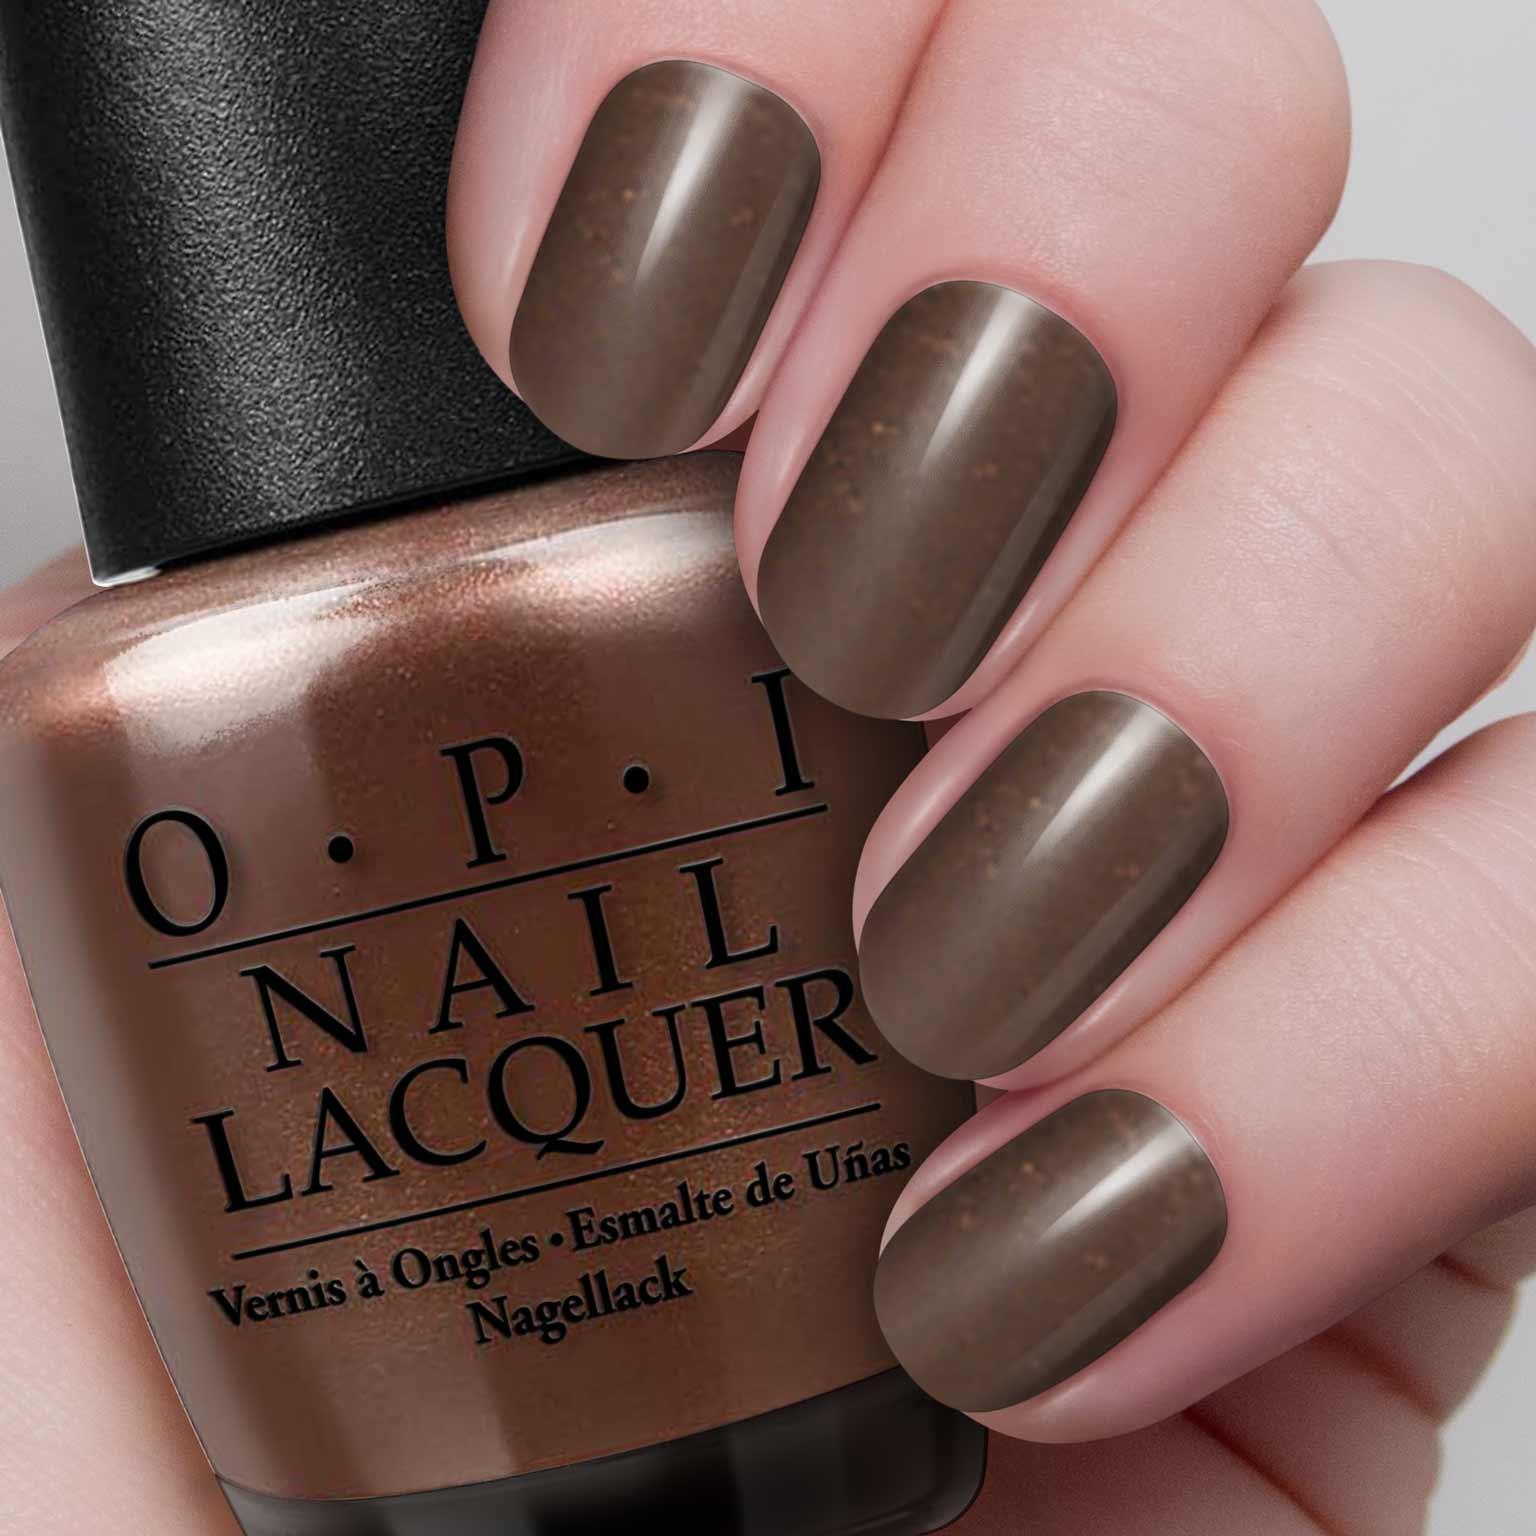 Opi nail polish brisbane bronze hollywood nails supply uk for Acrylic nails salon brisbane